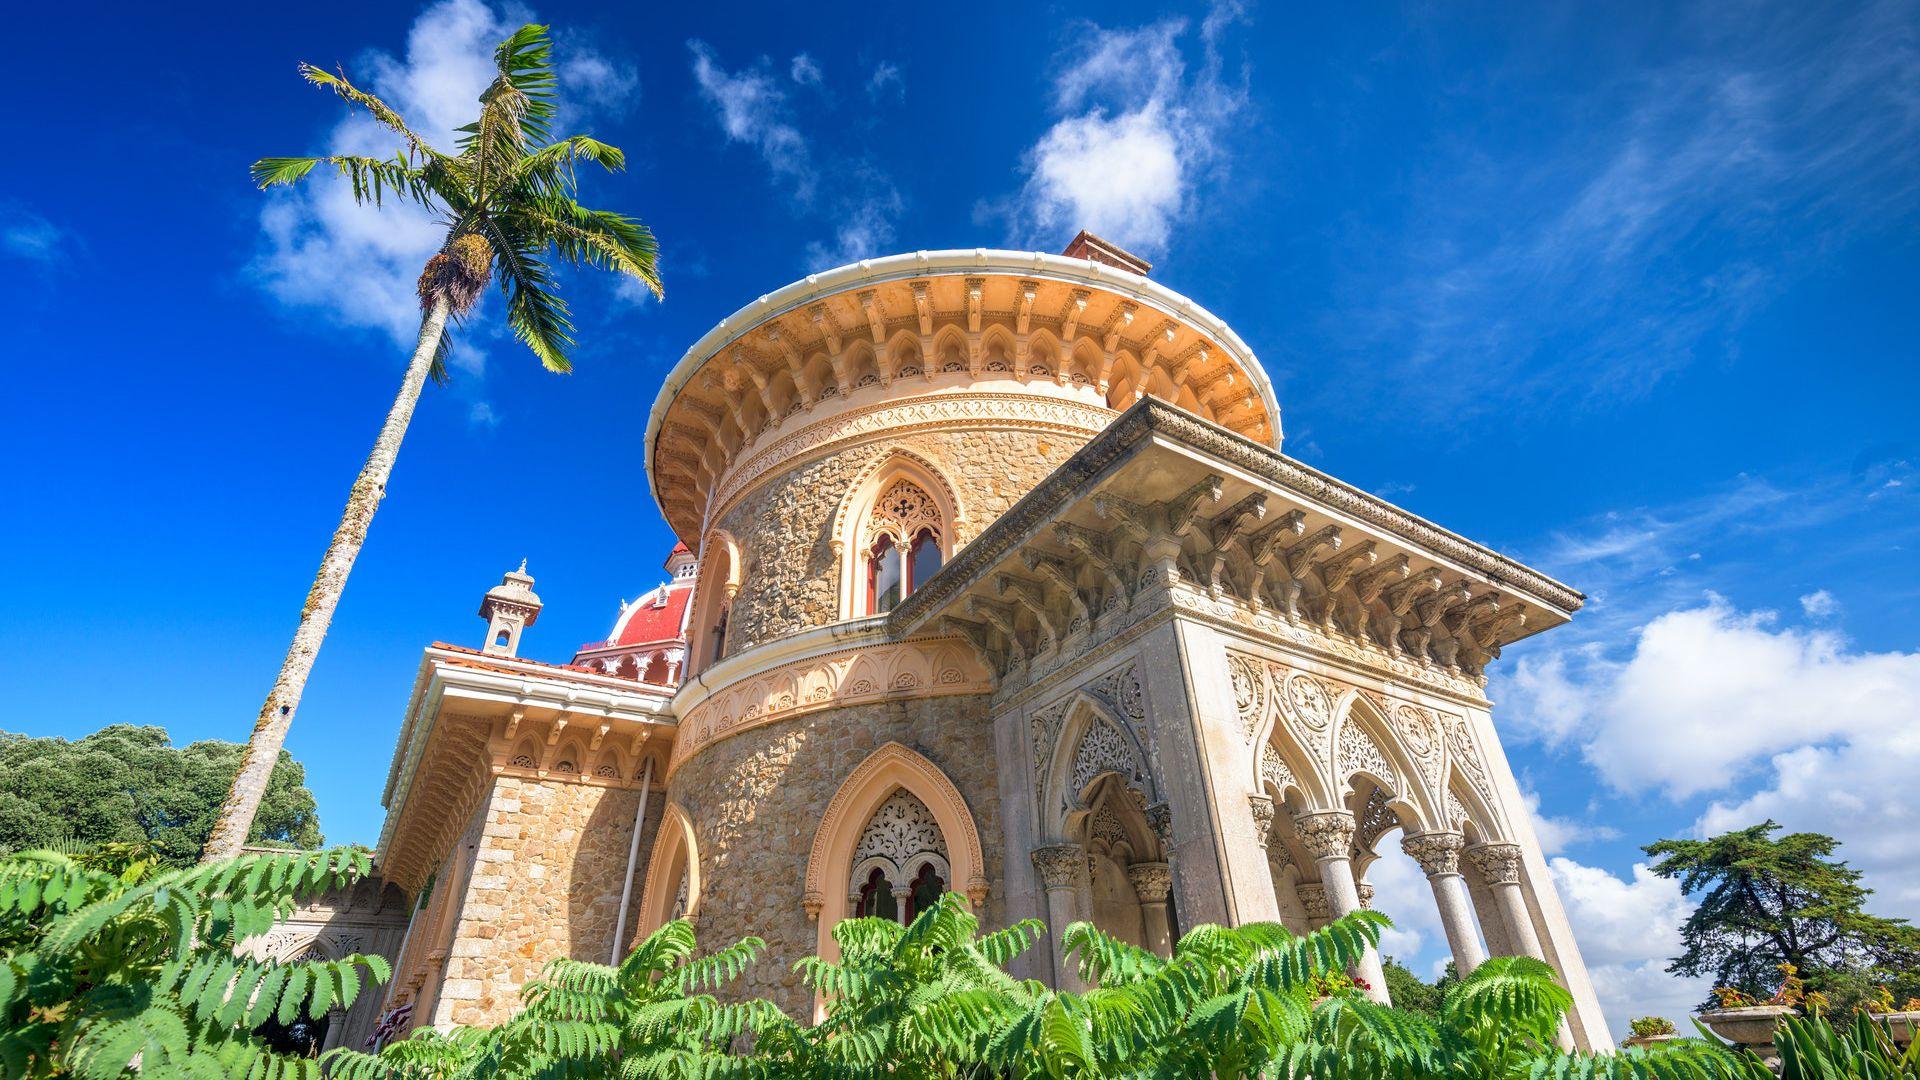 Monserrate Palace: Skip The Line